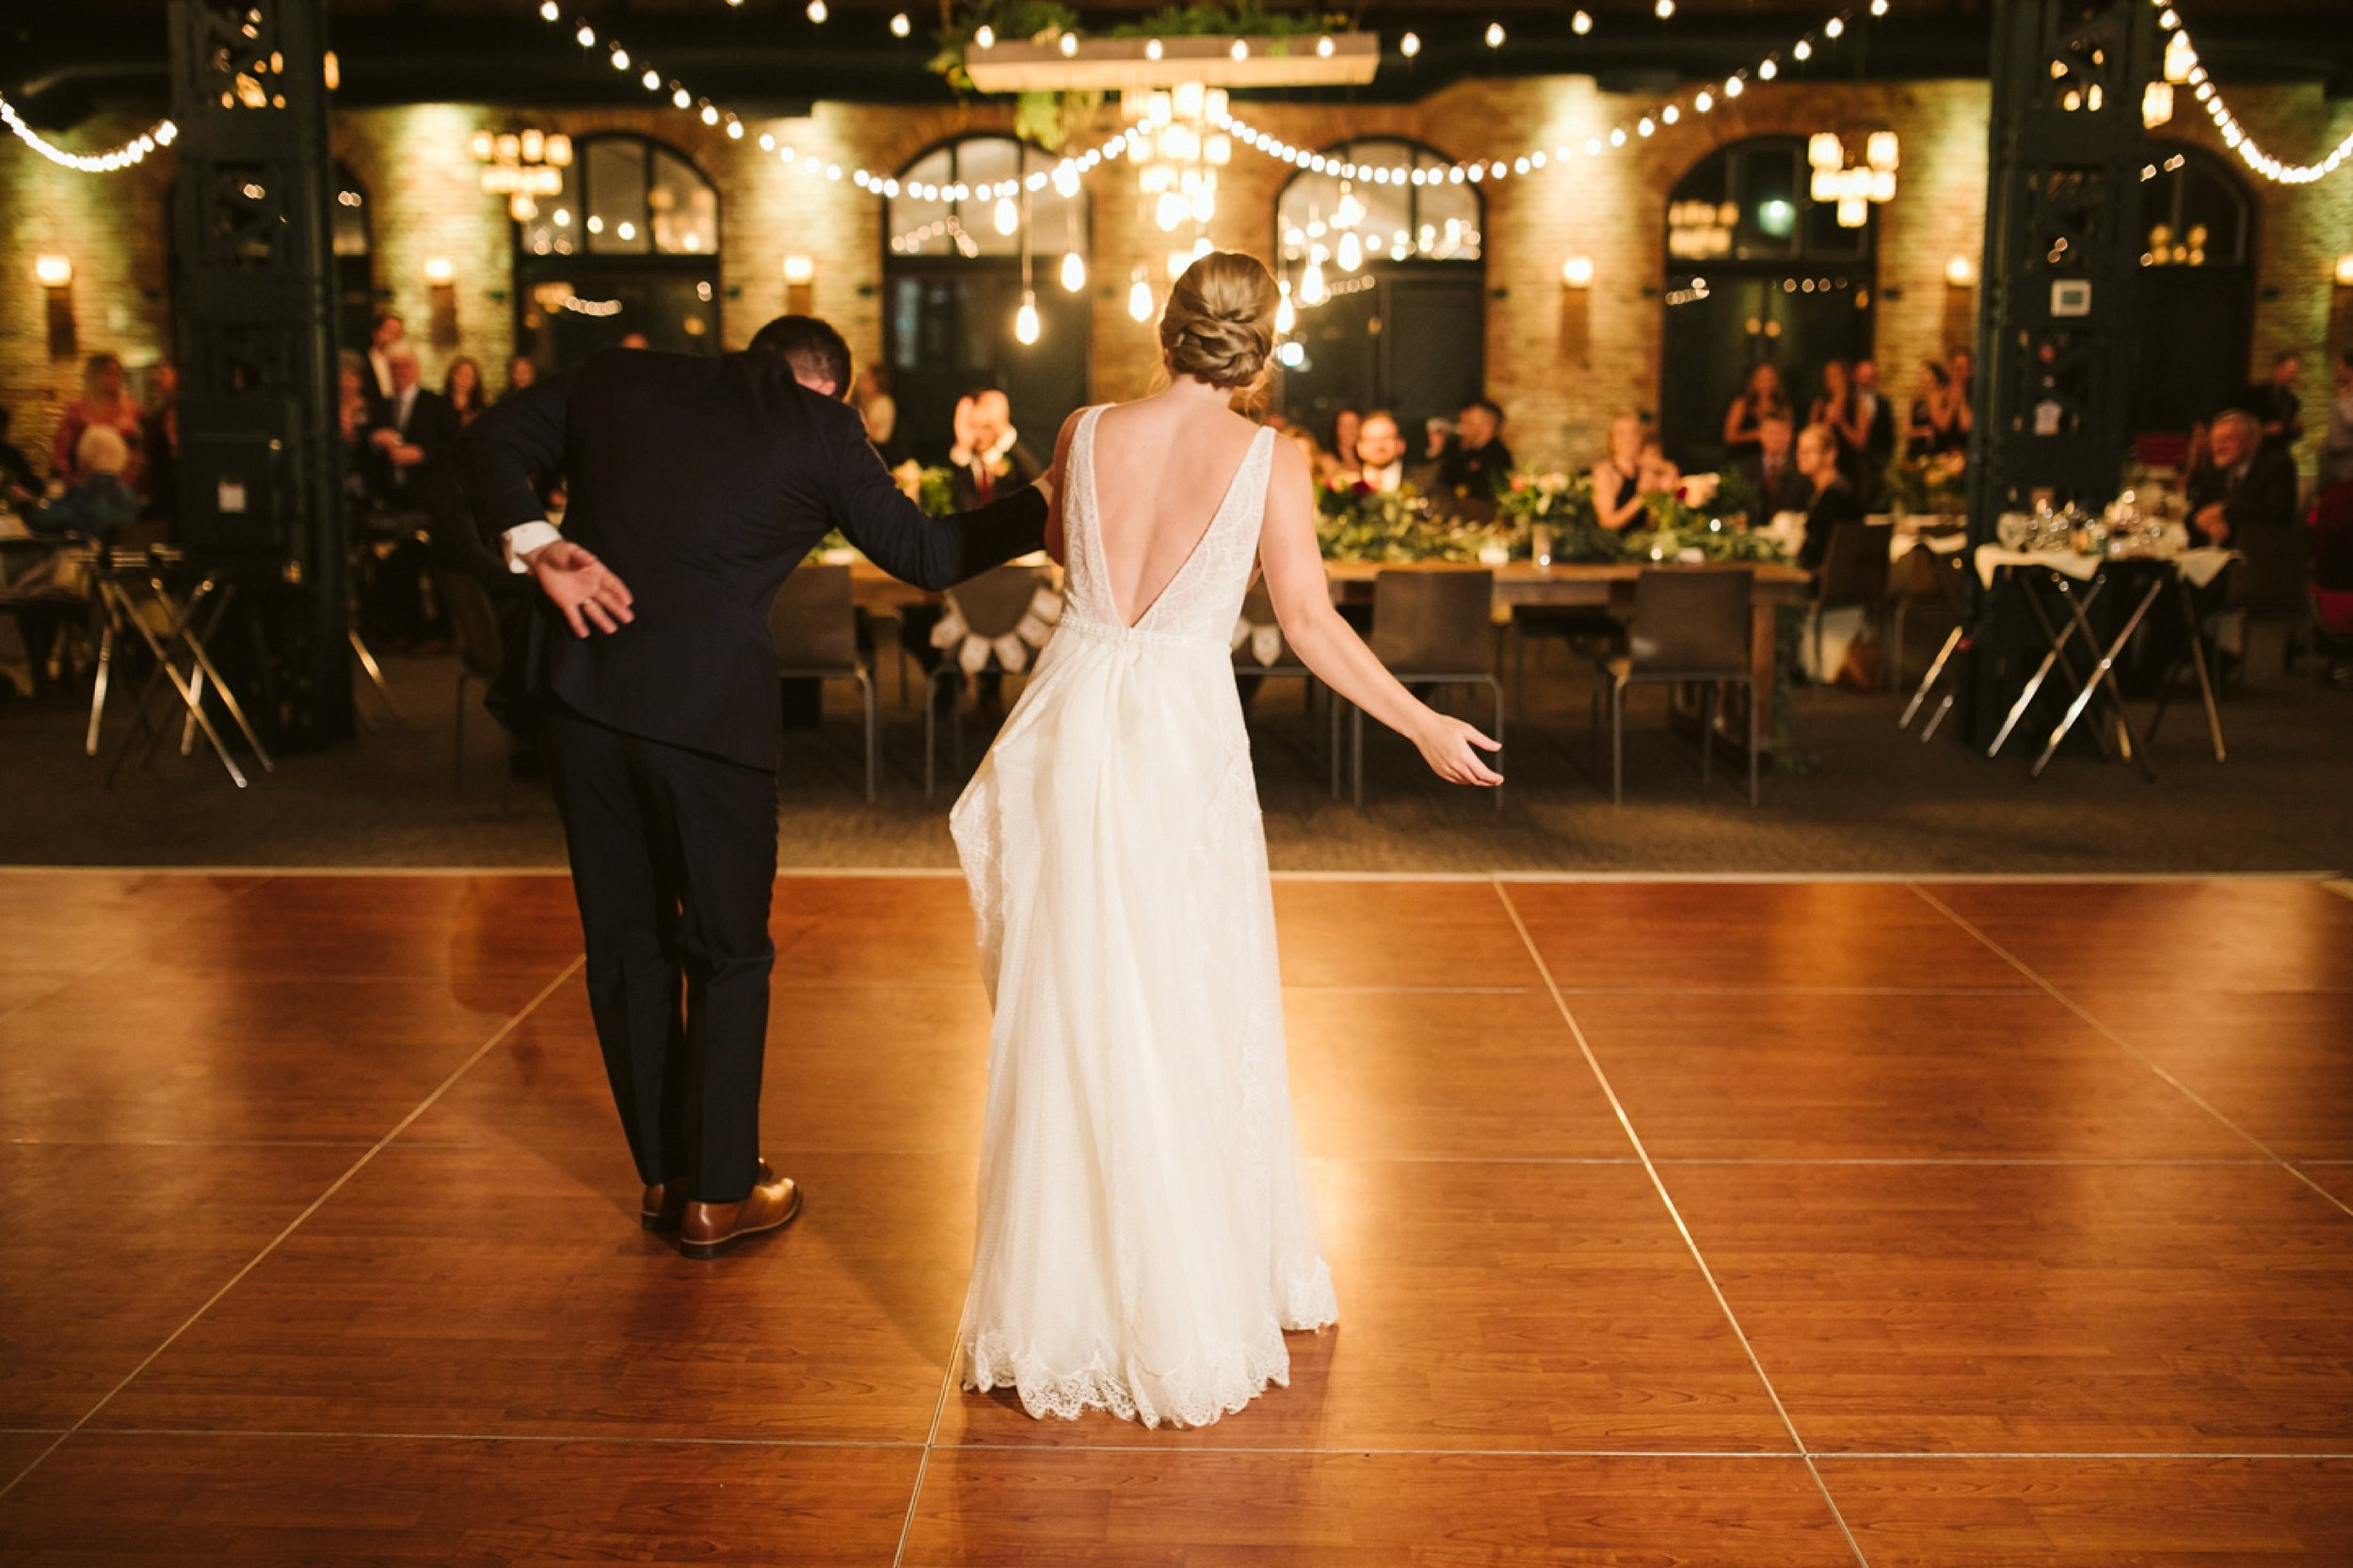 Nicollet-Island-Pavilion-Minneapolis-September-Coral-Navy-Wedding-172.jpg